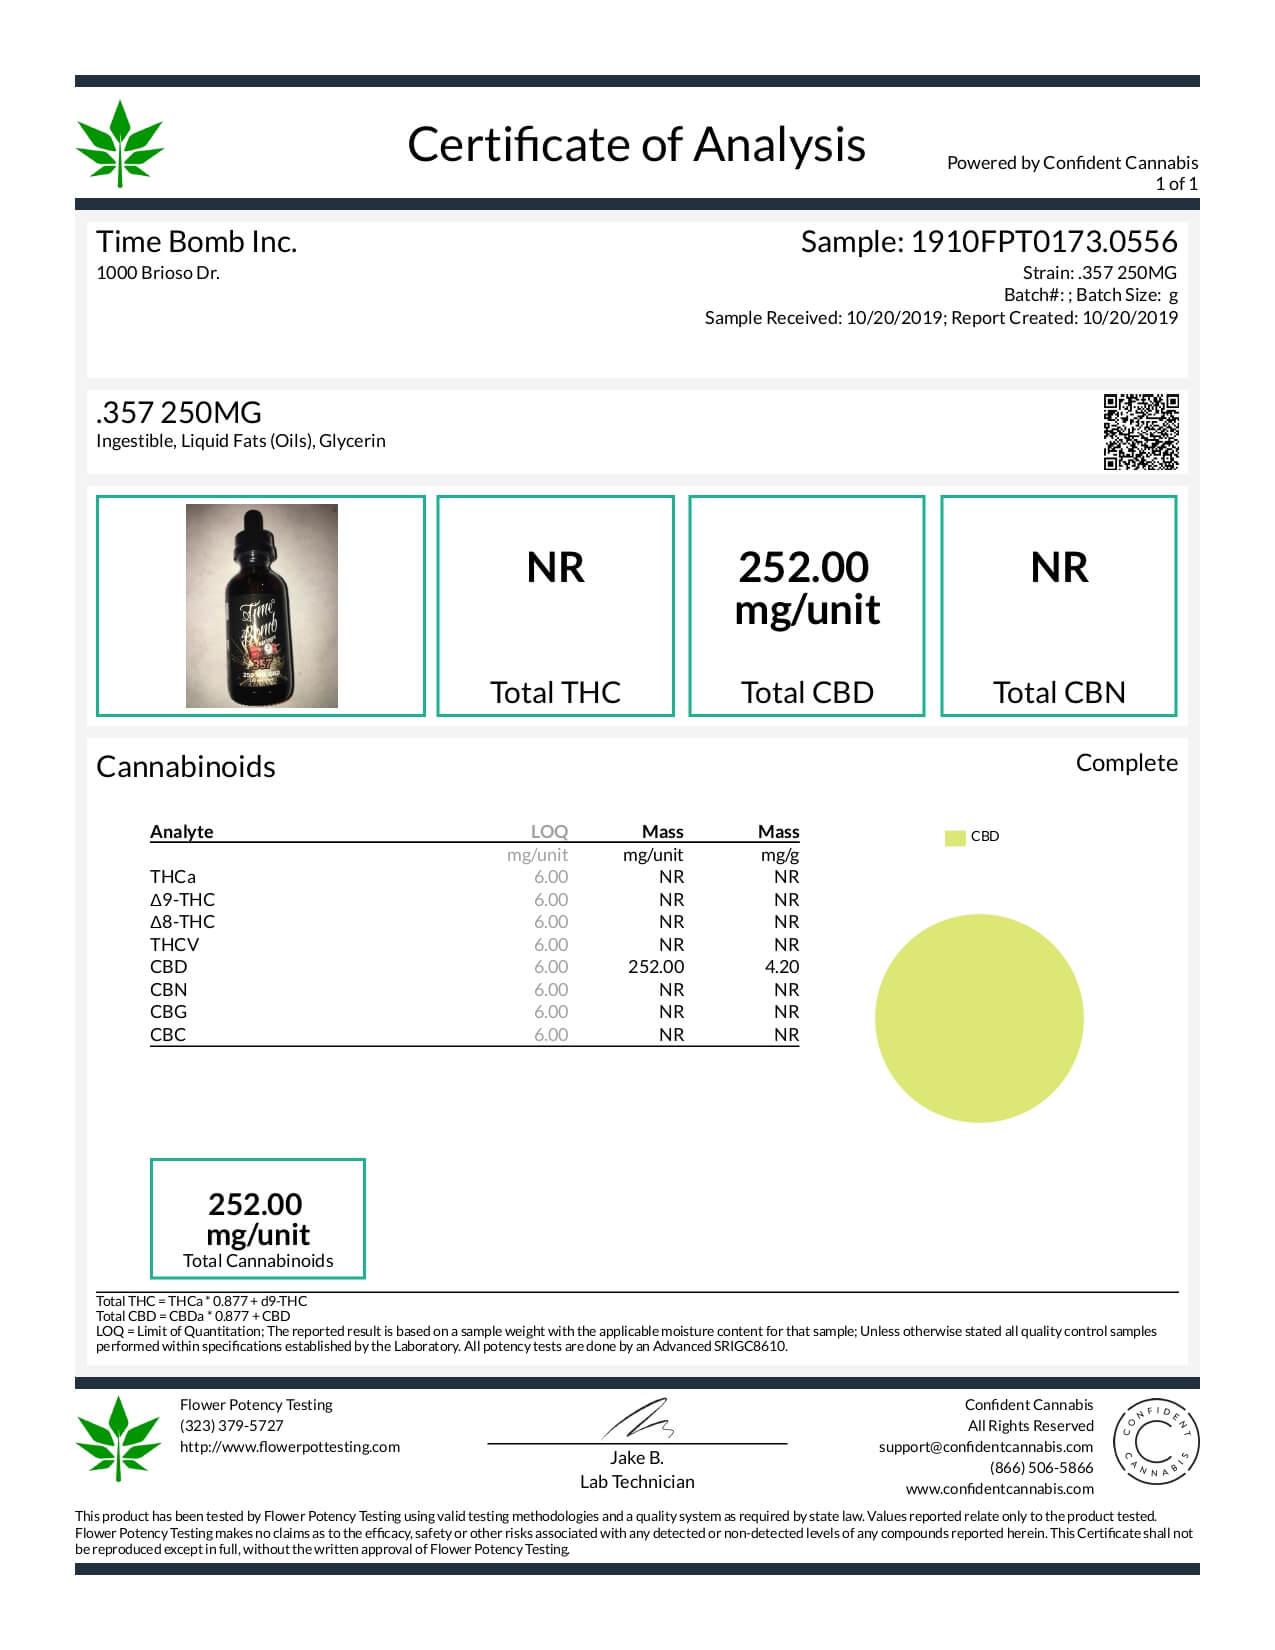 Time Bomb Extracts CBD Vape Juice 375 250mg Lab Report